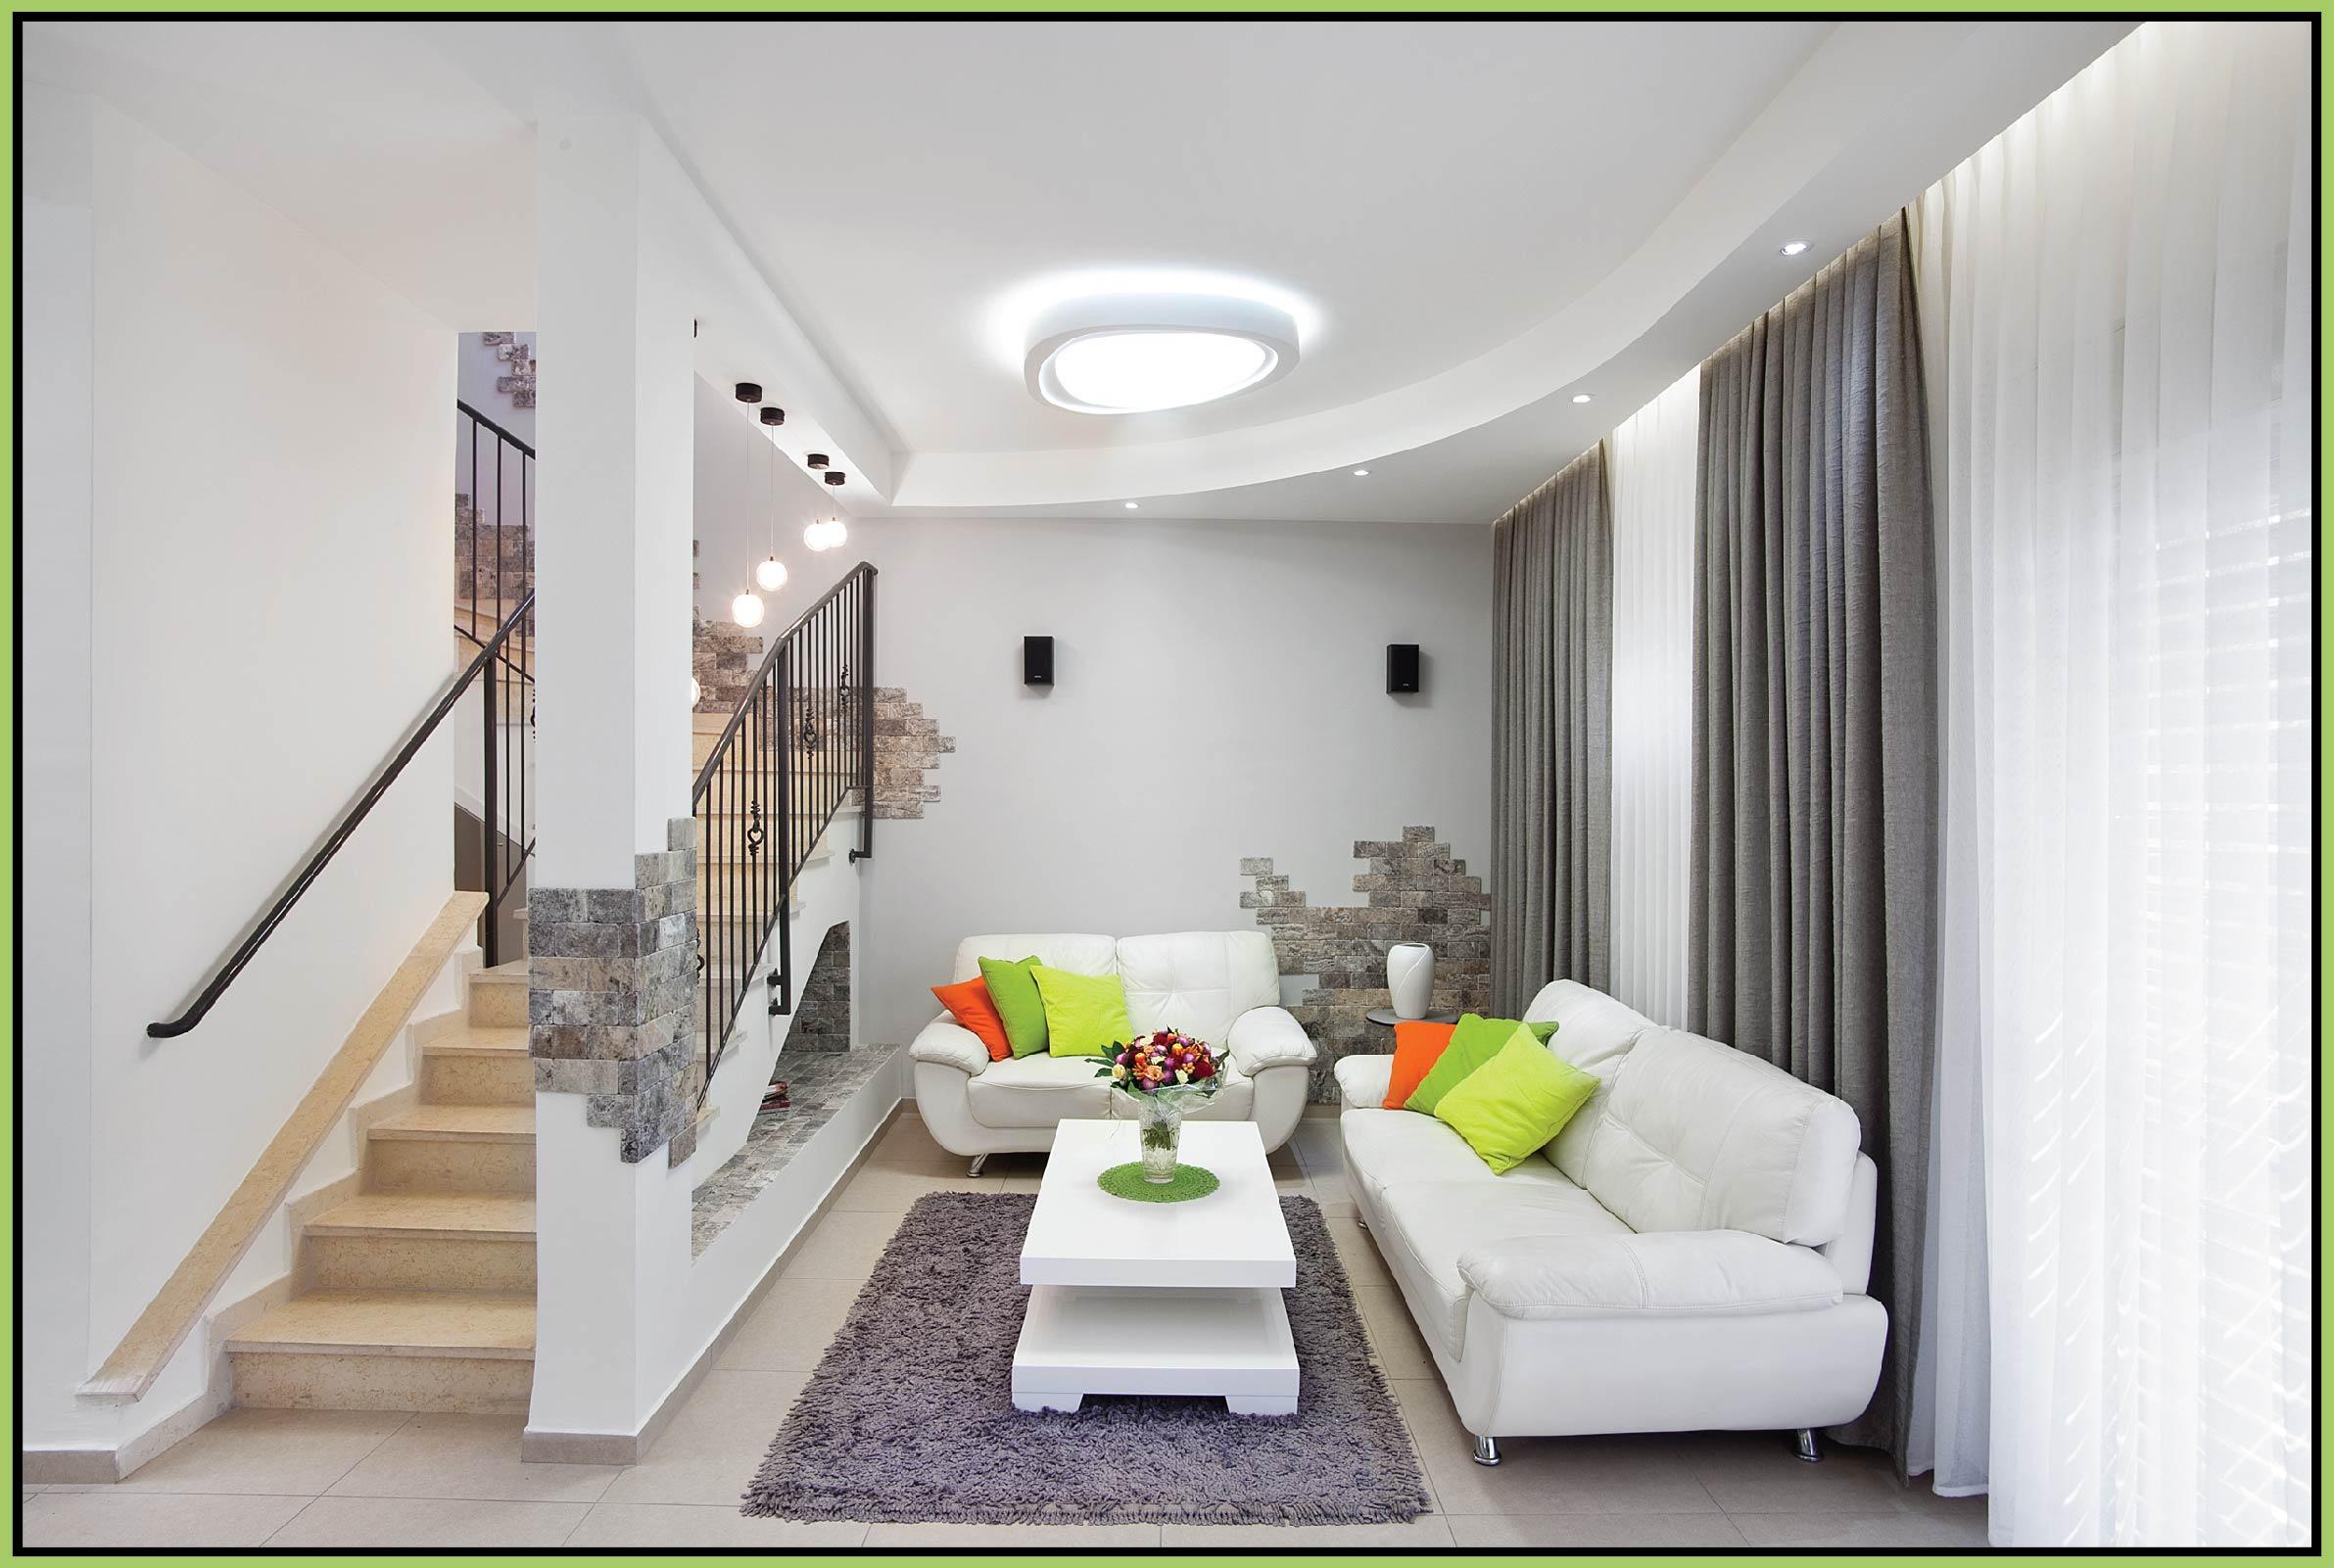 Plaster ceiling in modern style